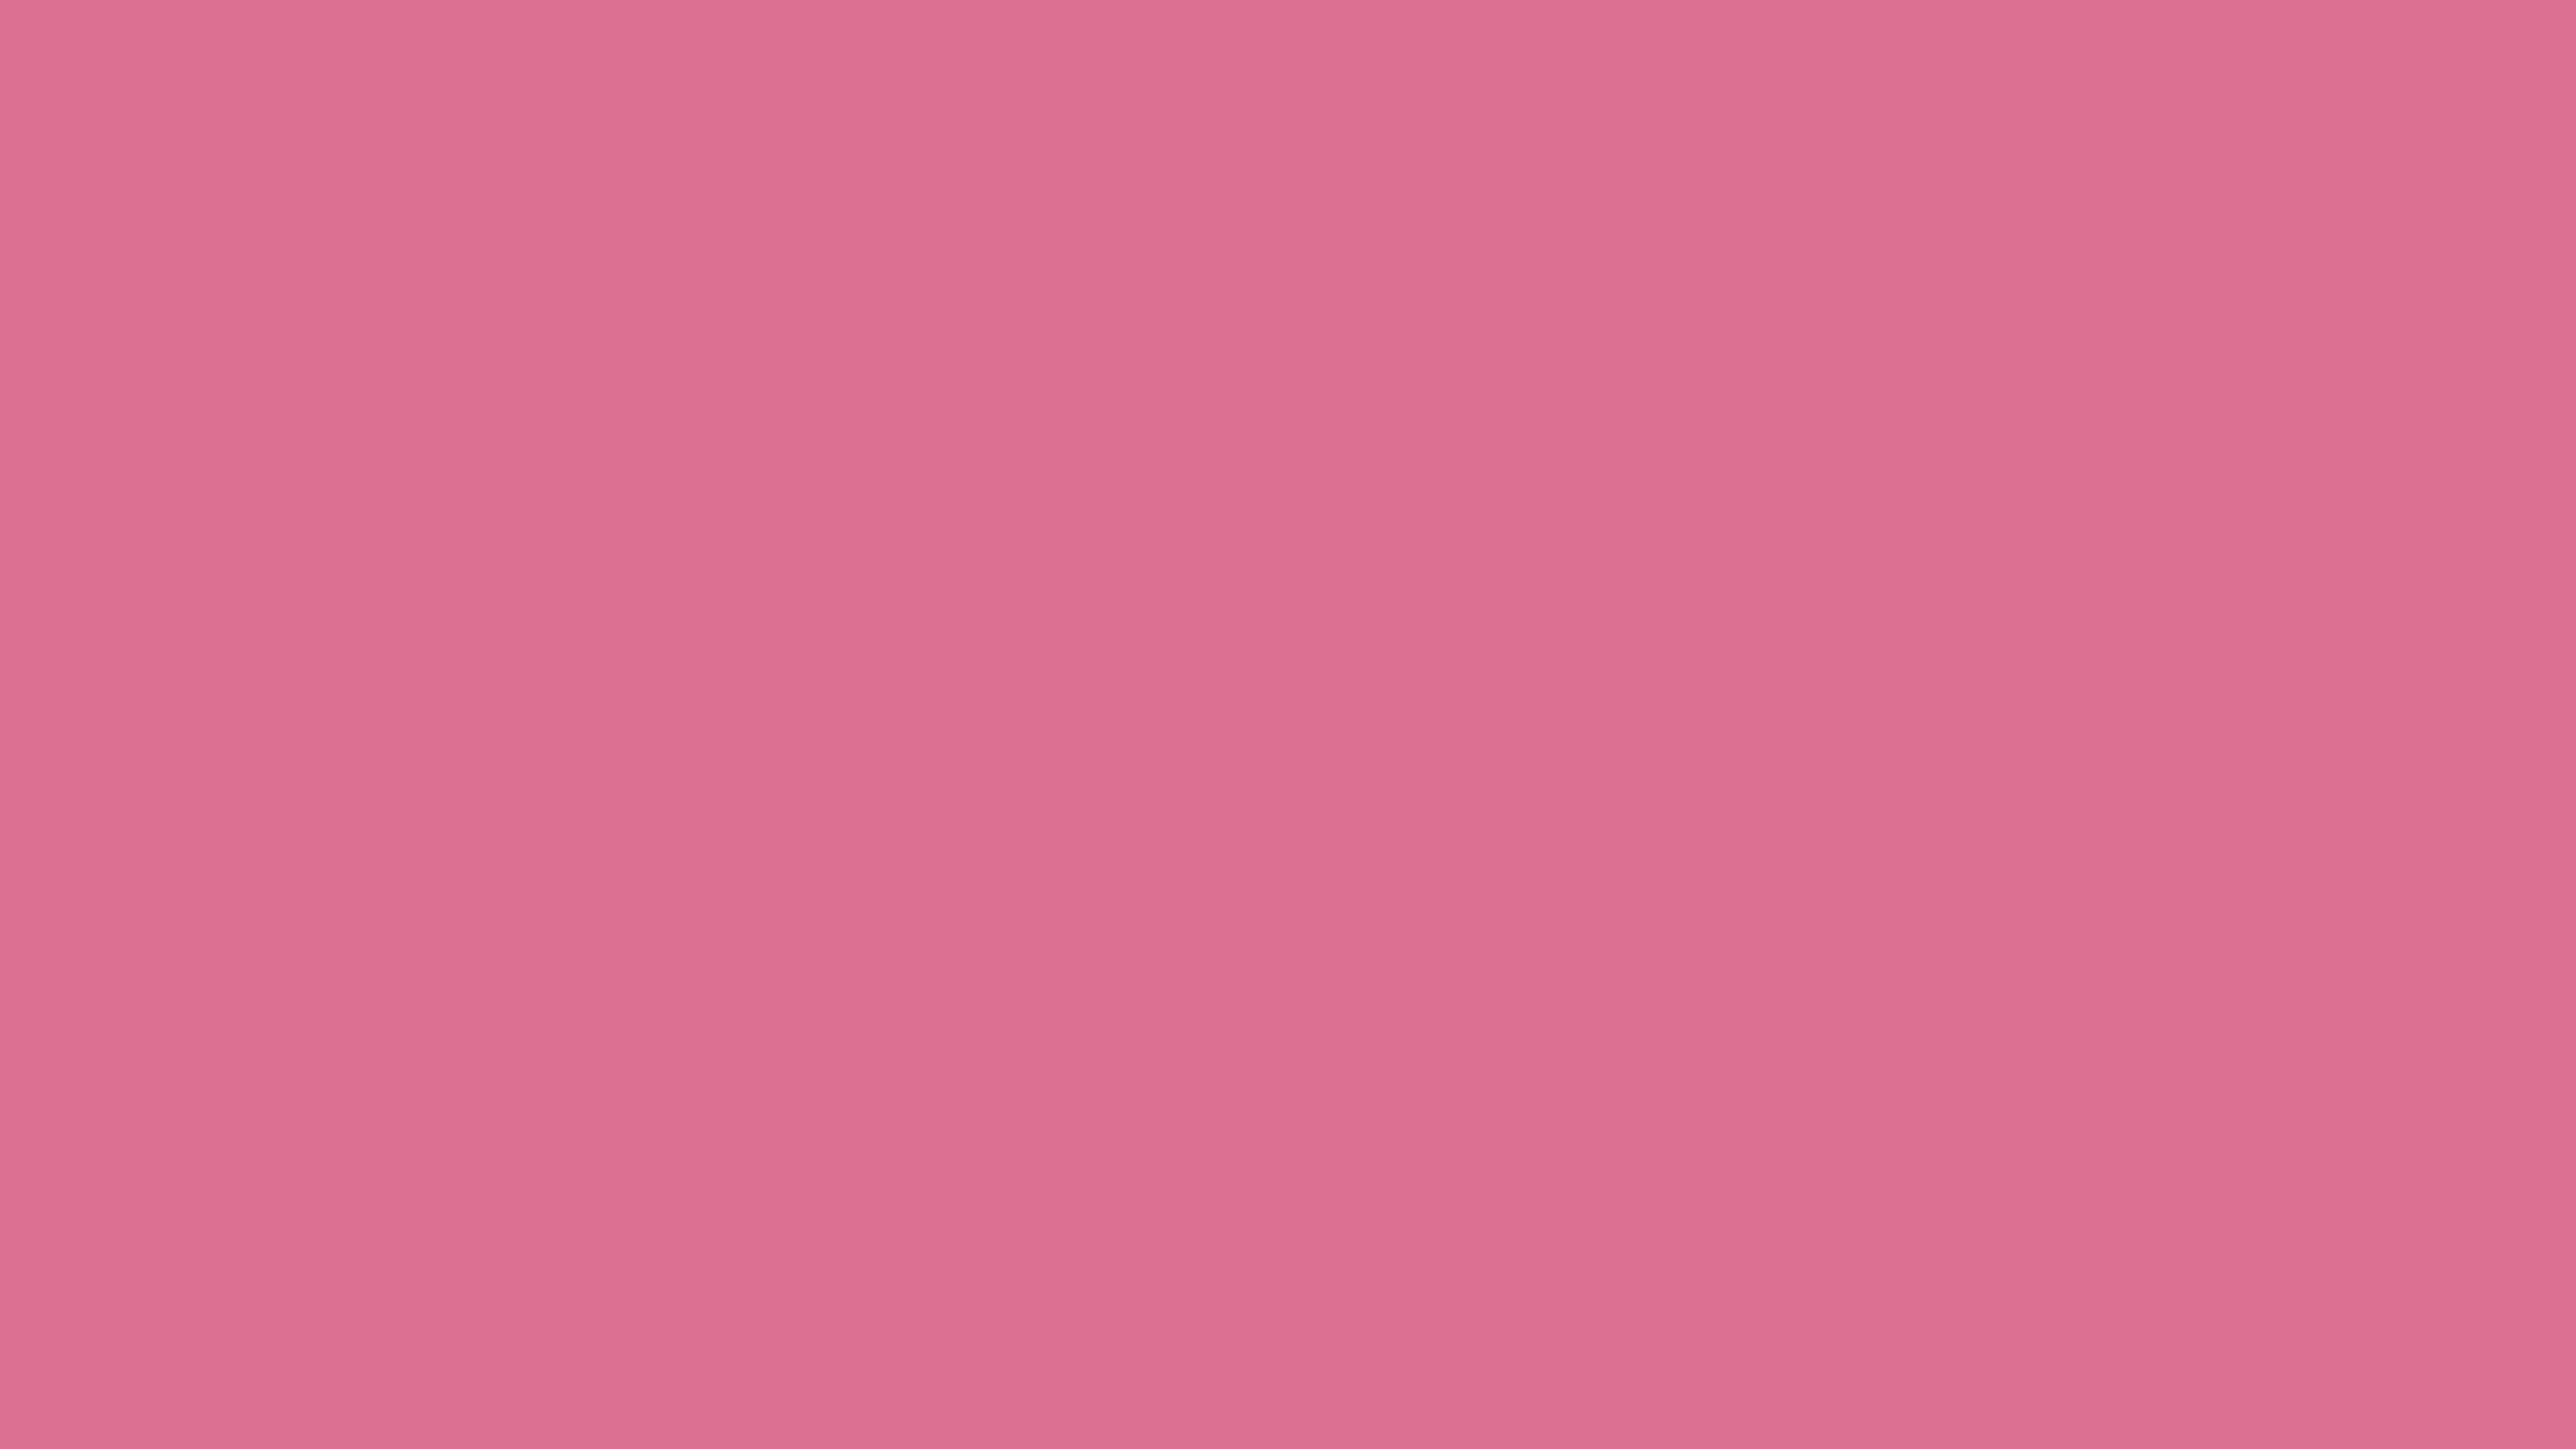 3840x2160 Pale Violet-red Solid Color Background